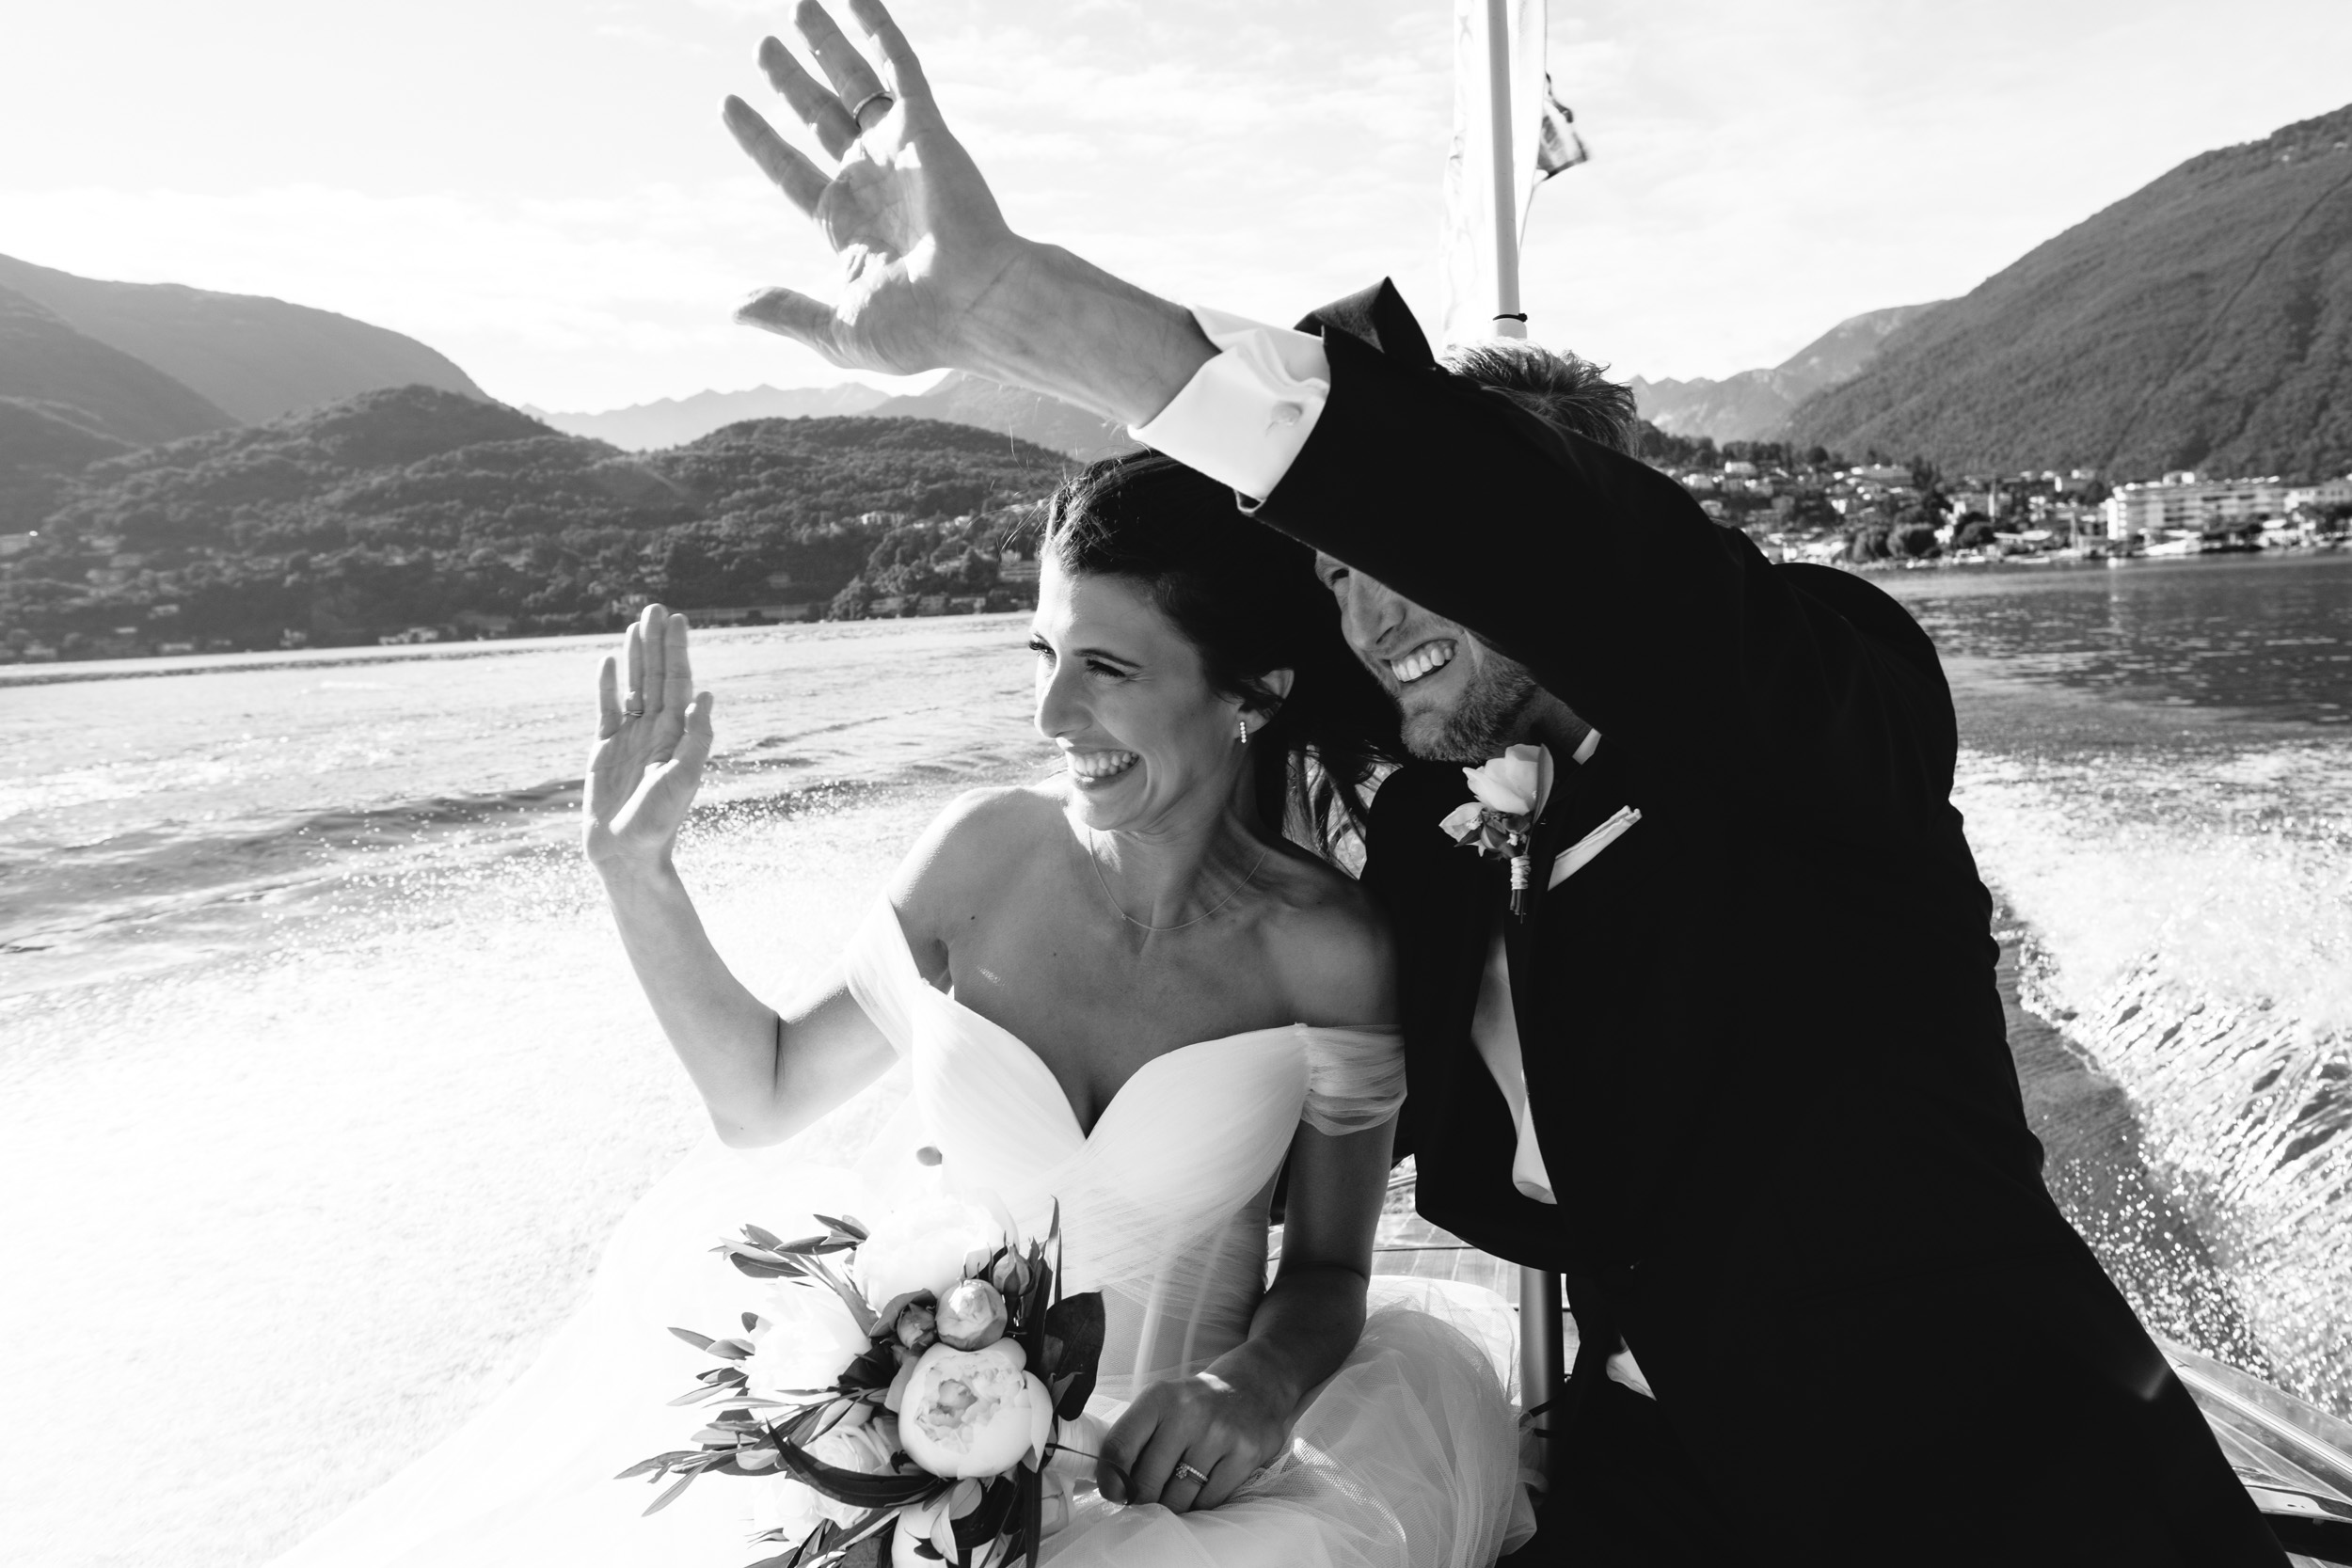 olivia-andreas-wedding-switzerland-440.jpg